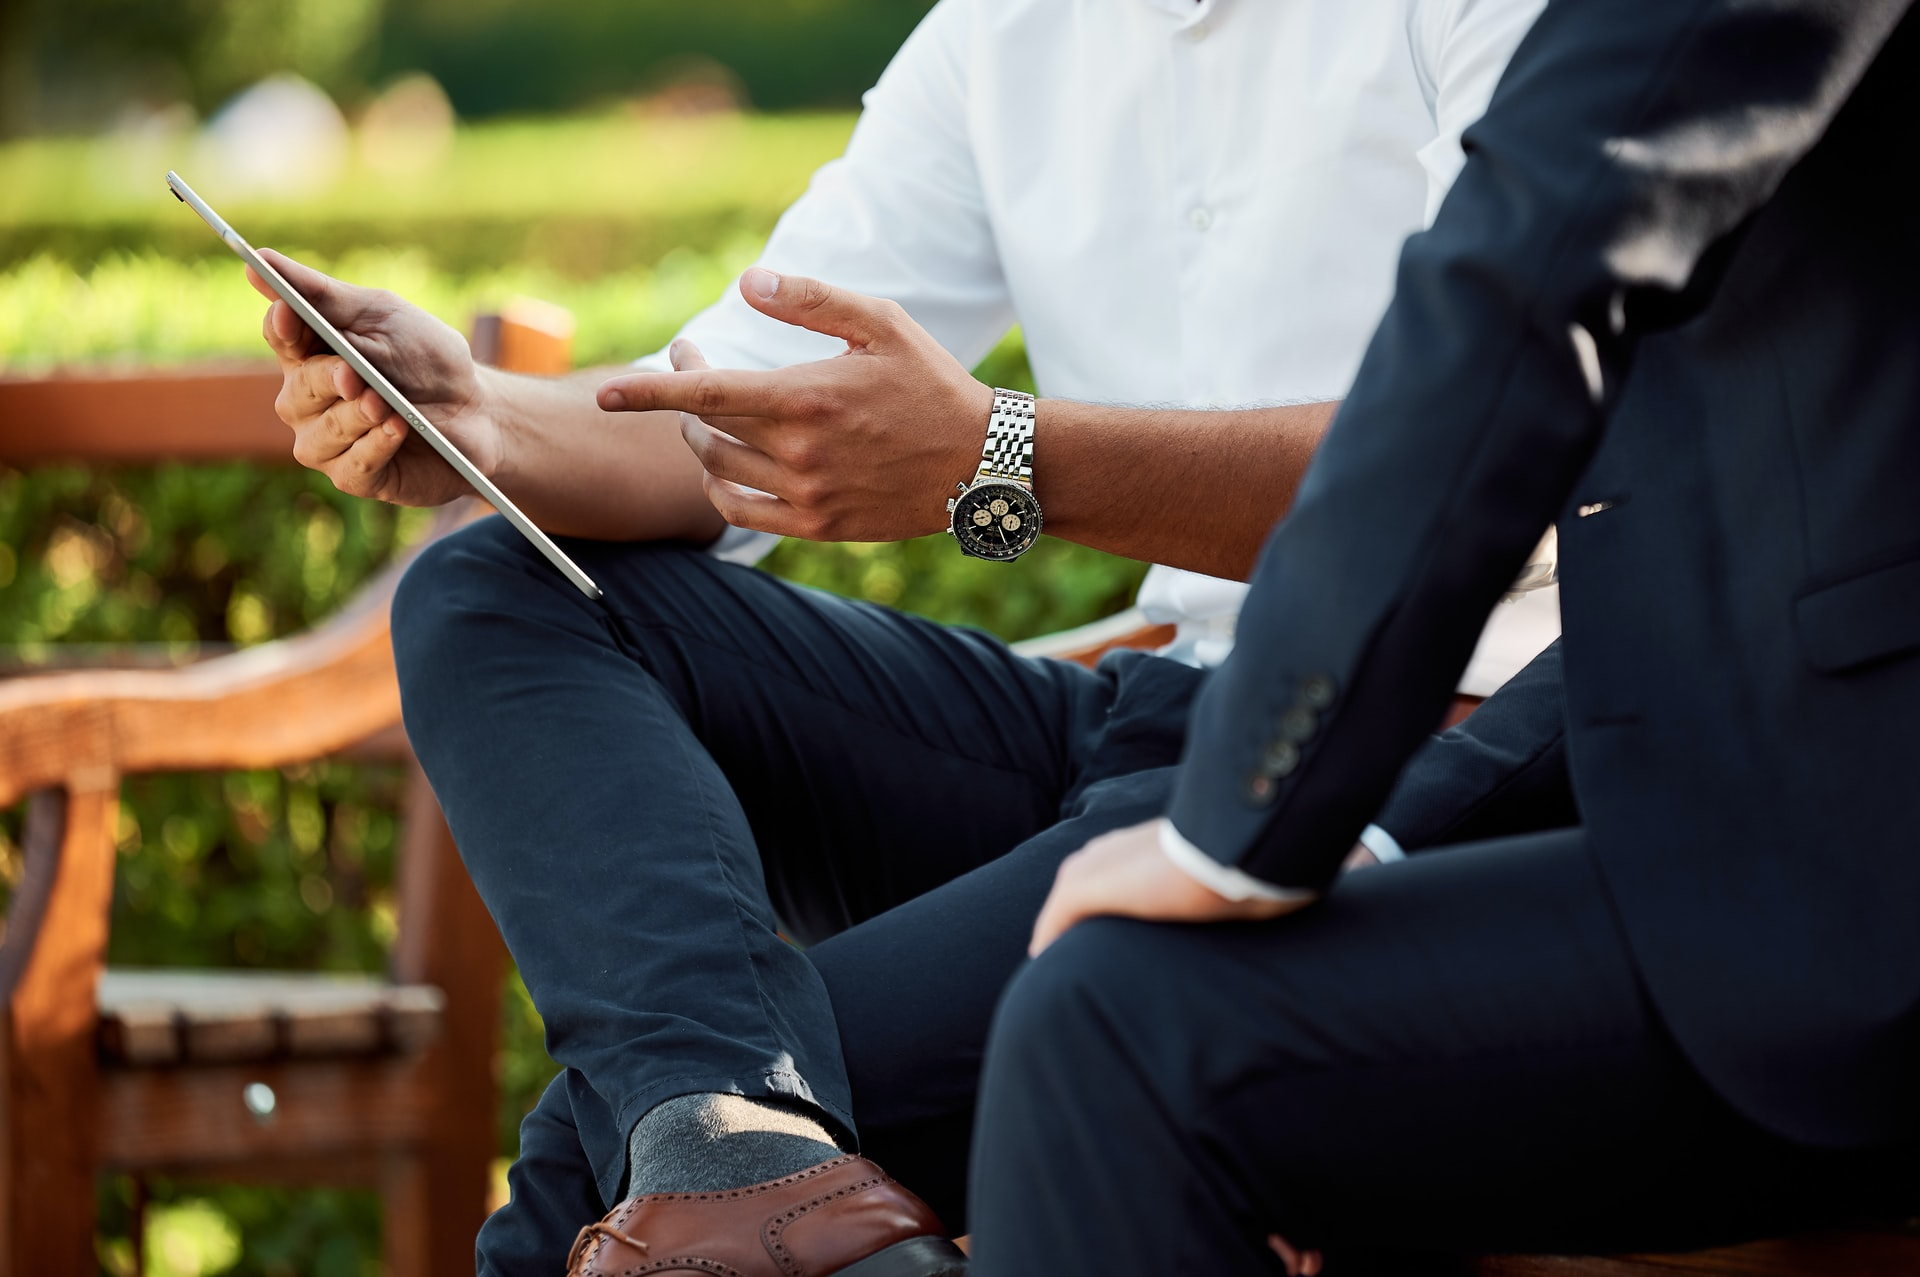 6 Management Tips for New Digital Marketing Agencies